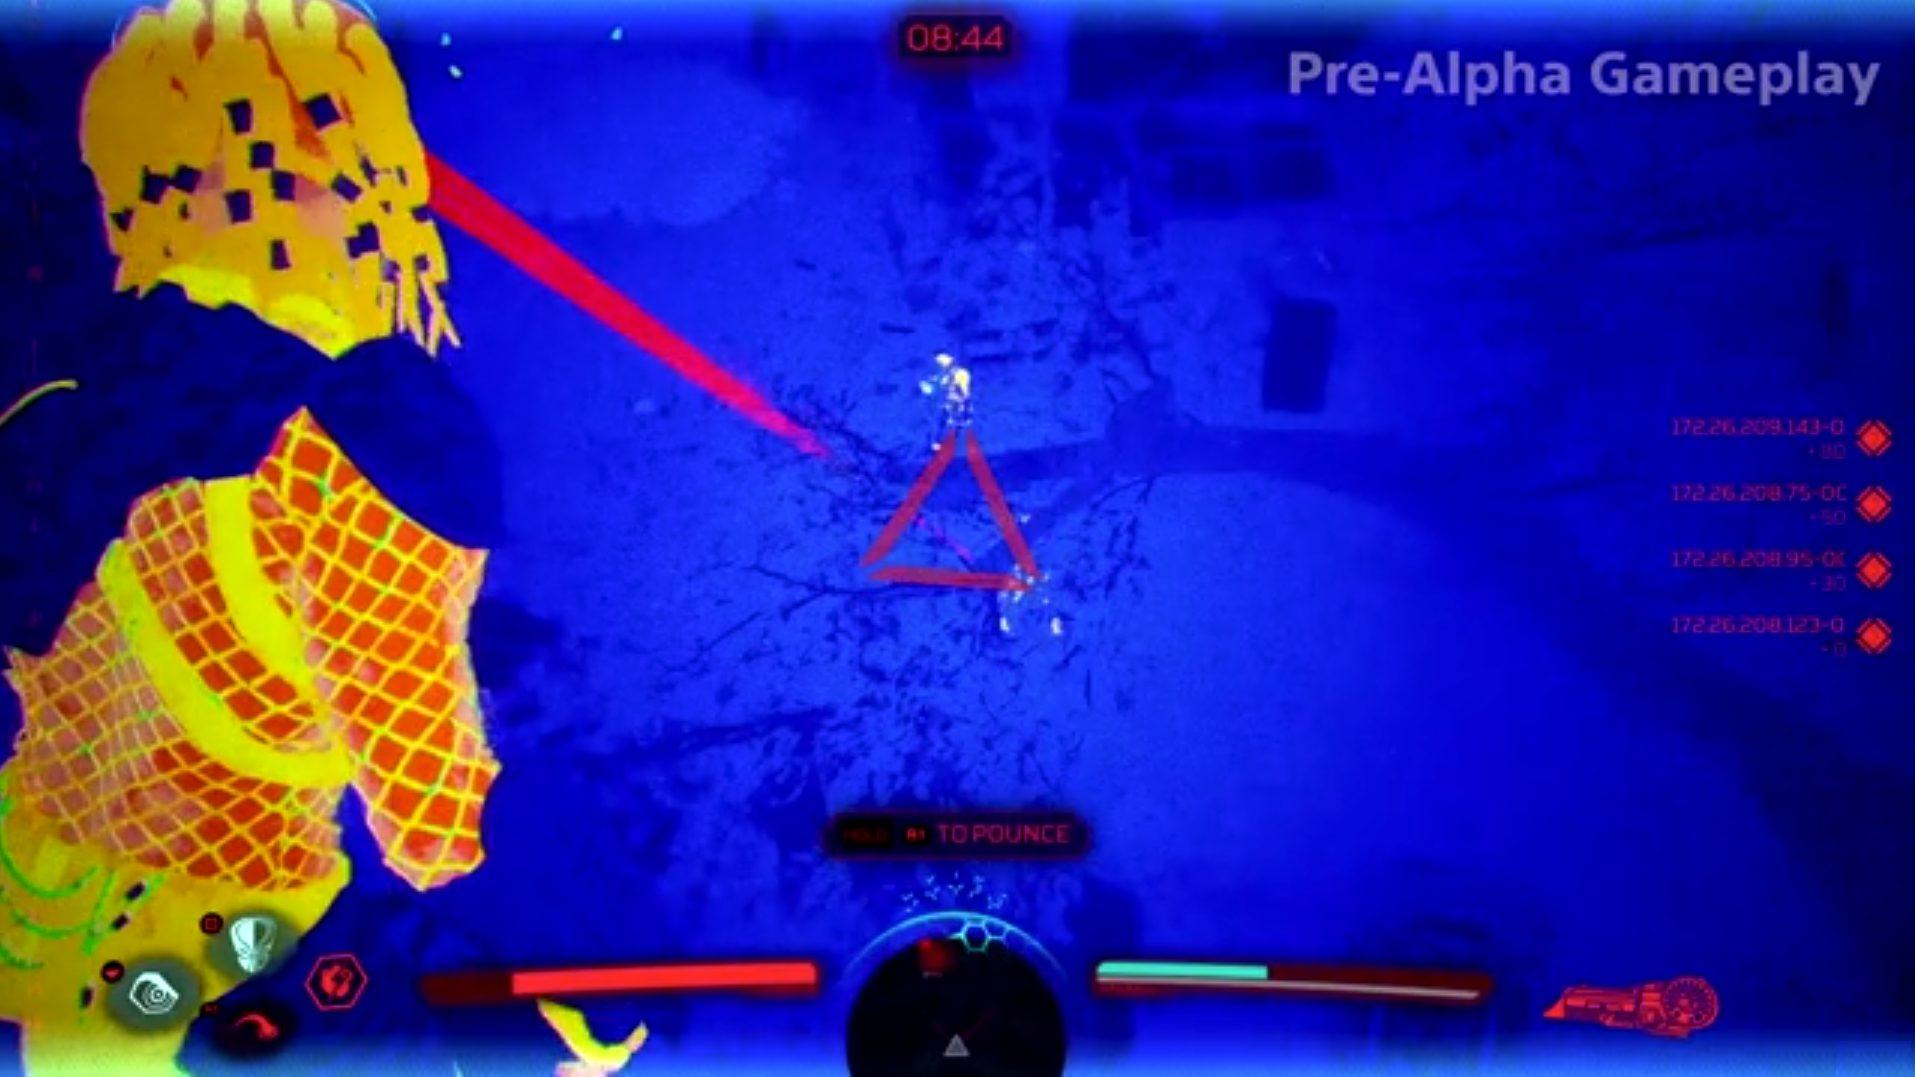 A Sneak peek of the Predator: Hunting Grounds Gameplay